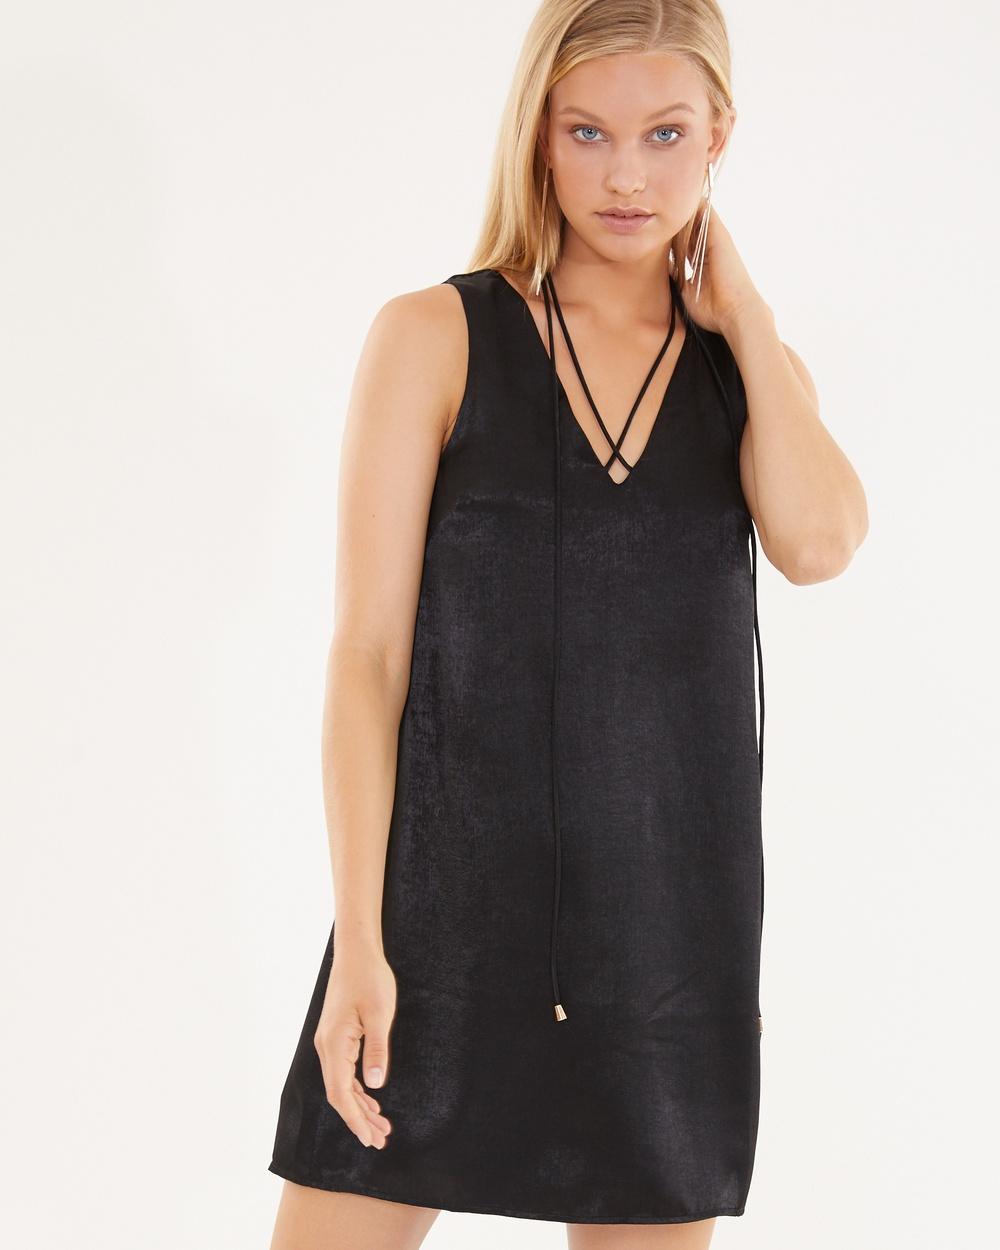 Photo of Tussah Black Kaiti Shift Dress - beautiful dress from Tussah online